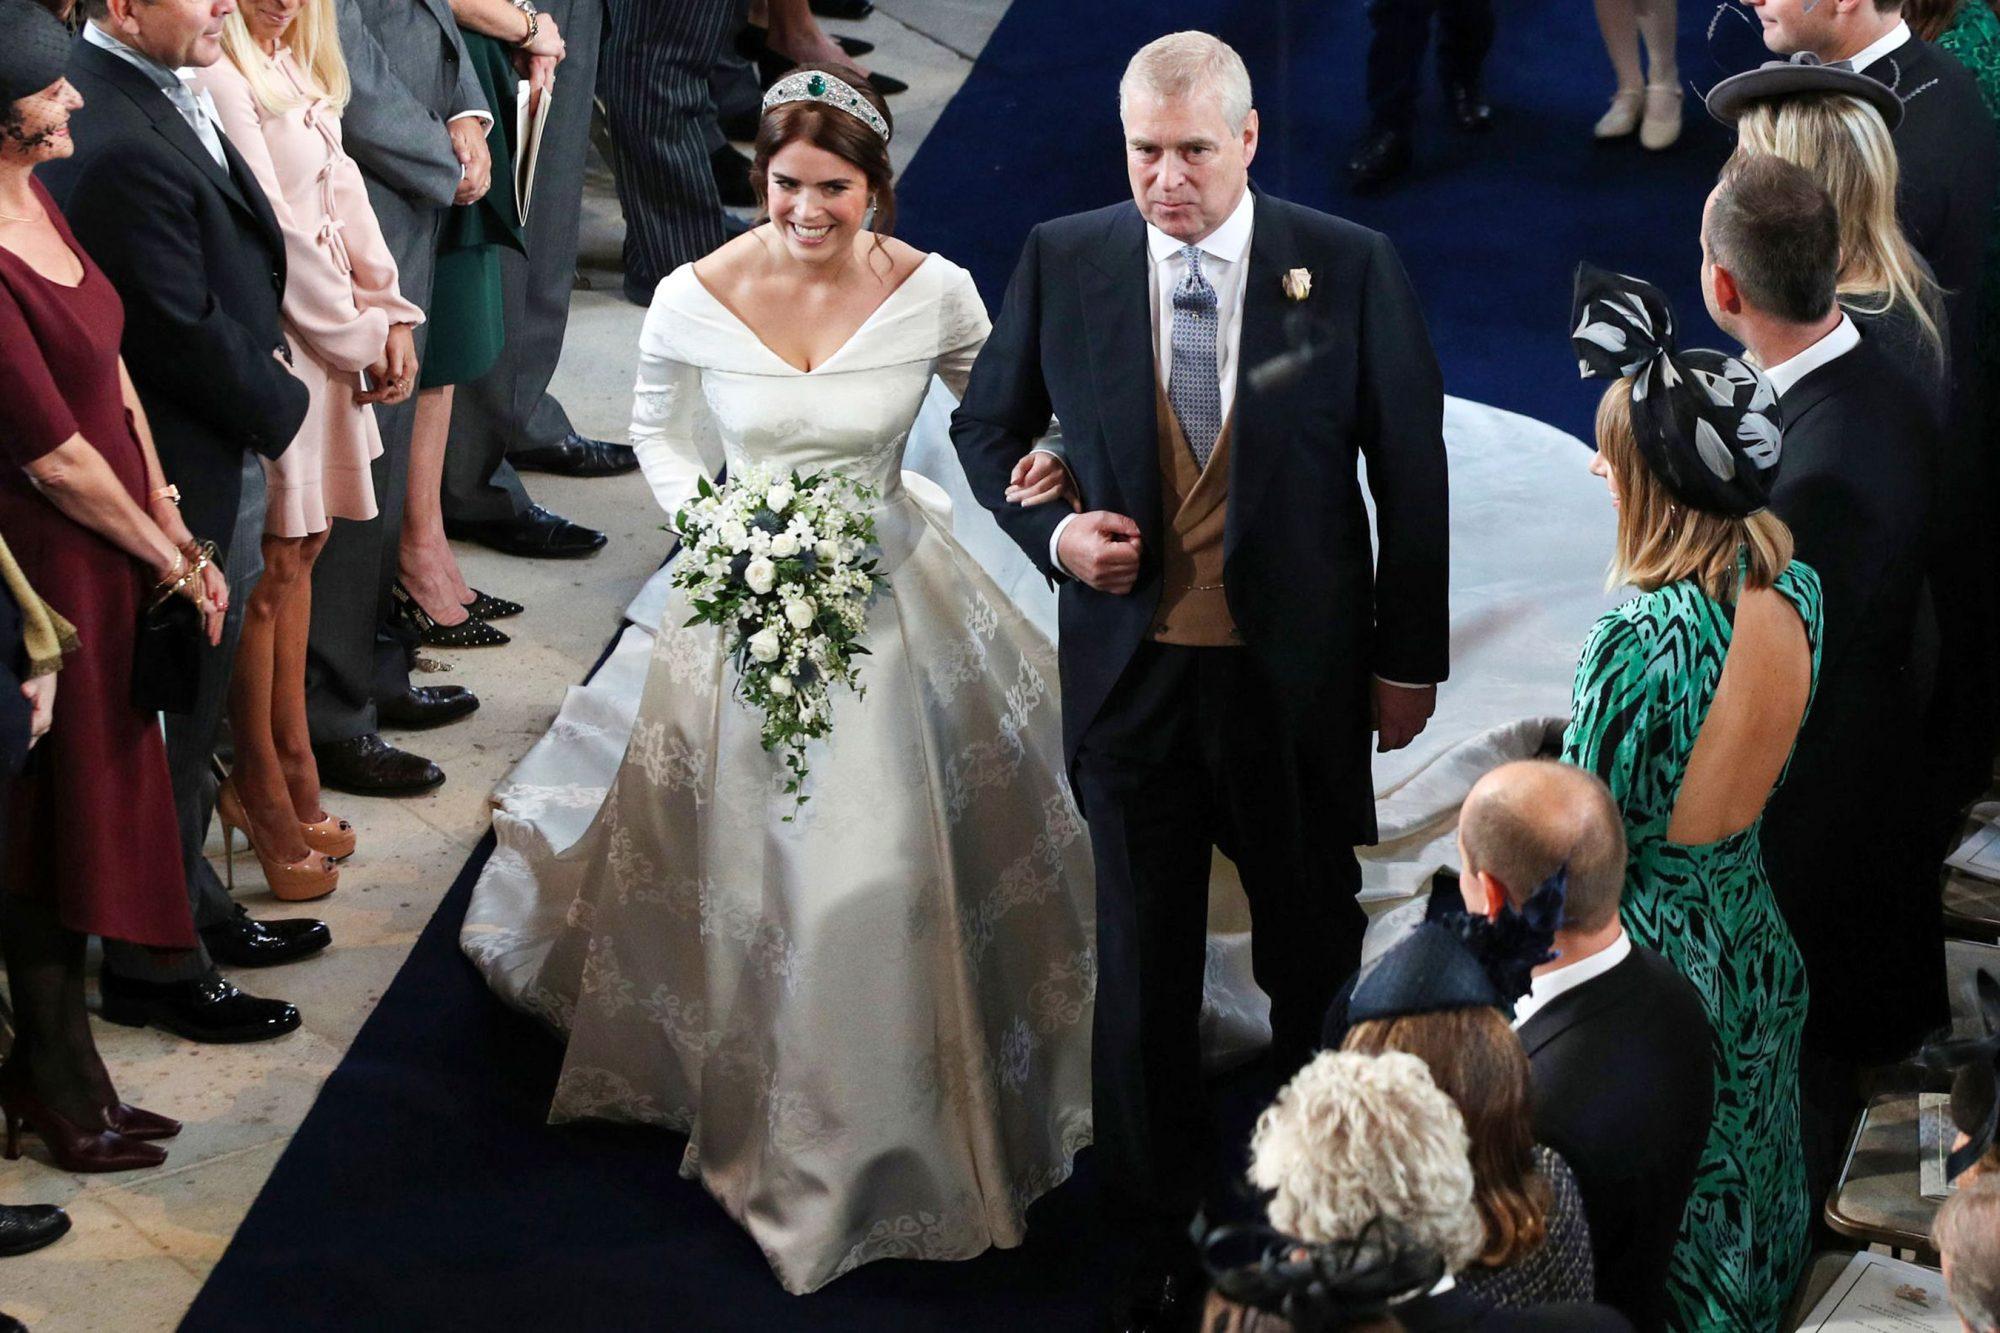 The wedding of Princess Eugenie and Jack Brooksbank, Ceremony, St George's Chapel, Windsor Castle, Berkshire, UK -  12 Oct 2018